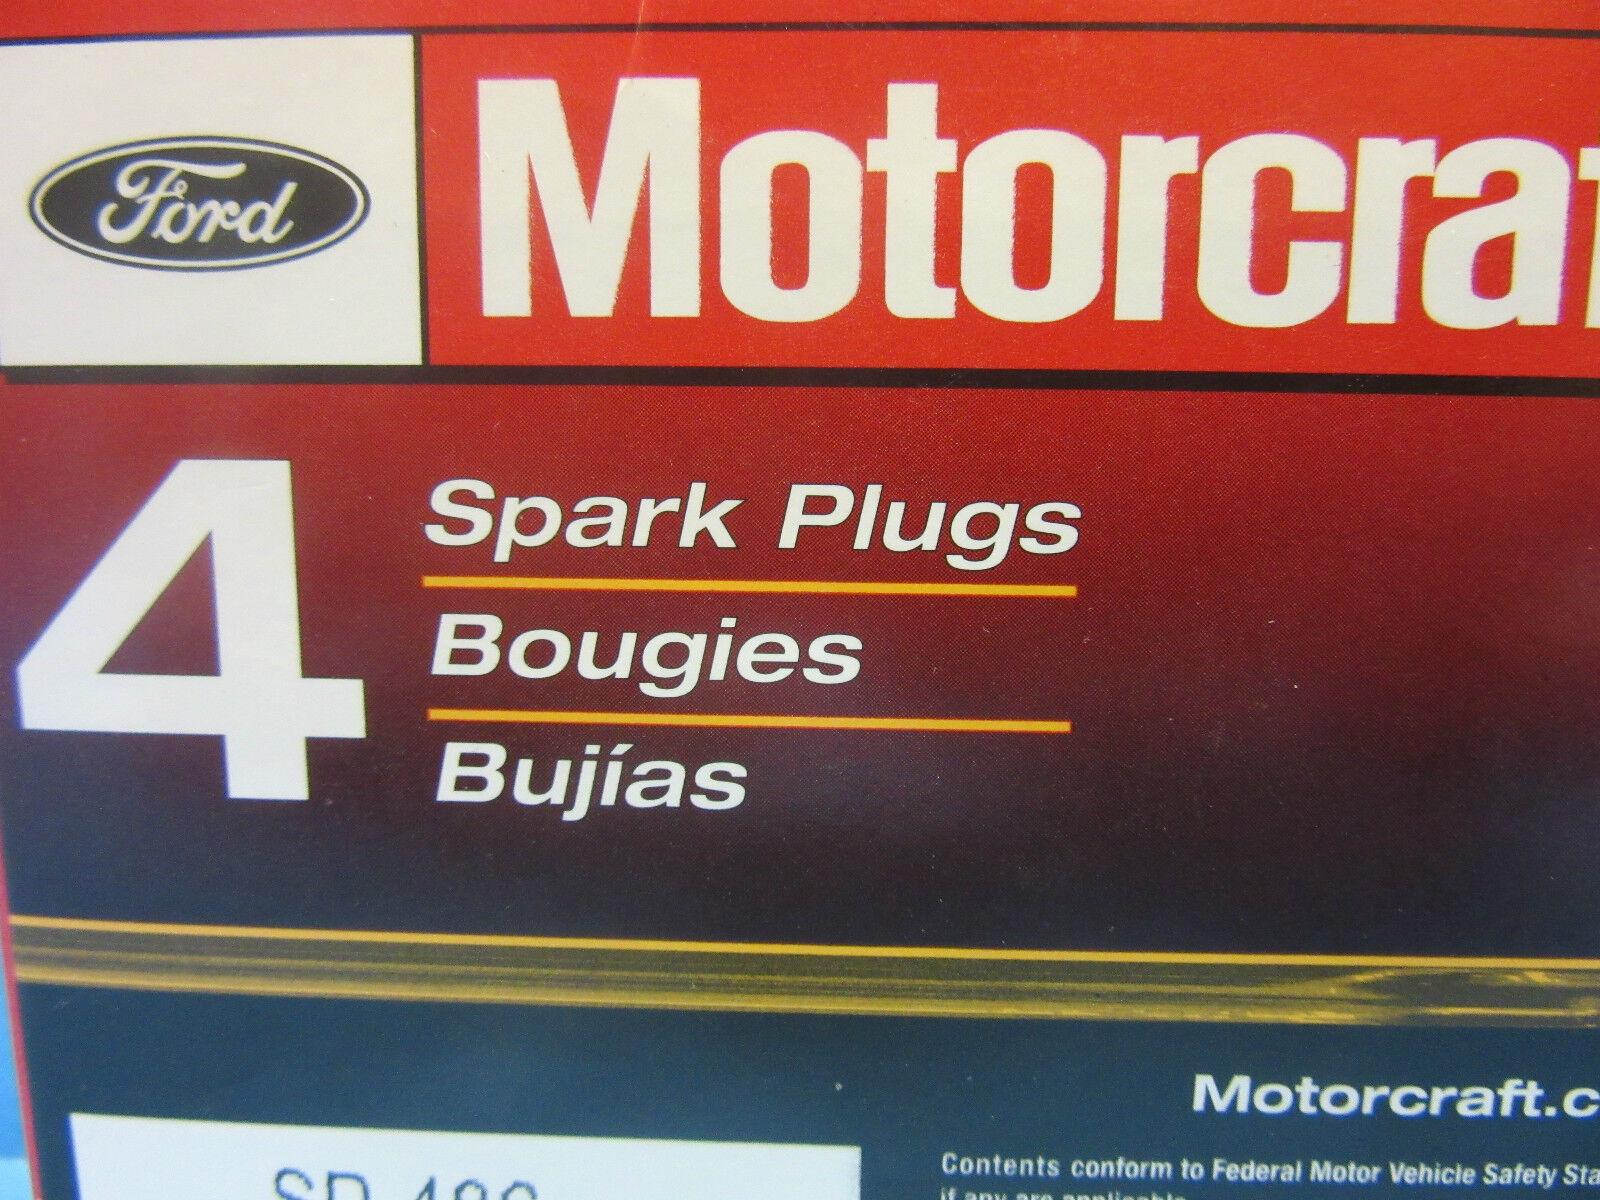 Ford Mondeo Ford Cougar 2.5 V6 bujías X 6